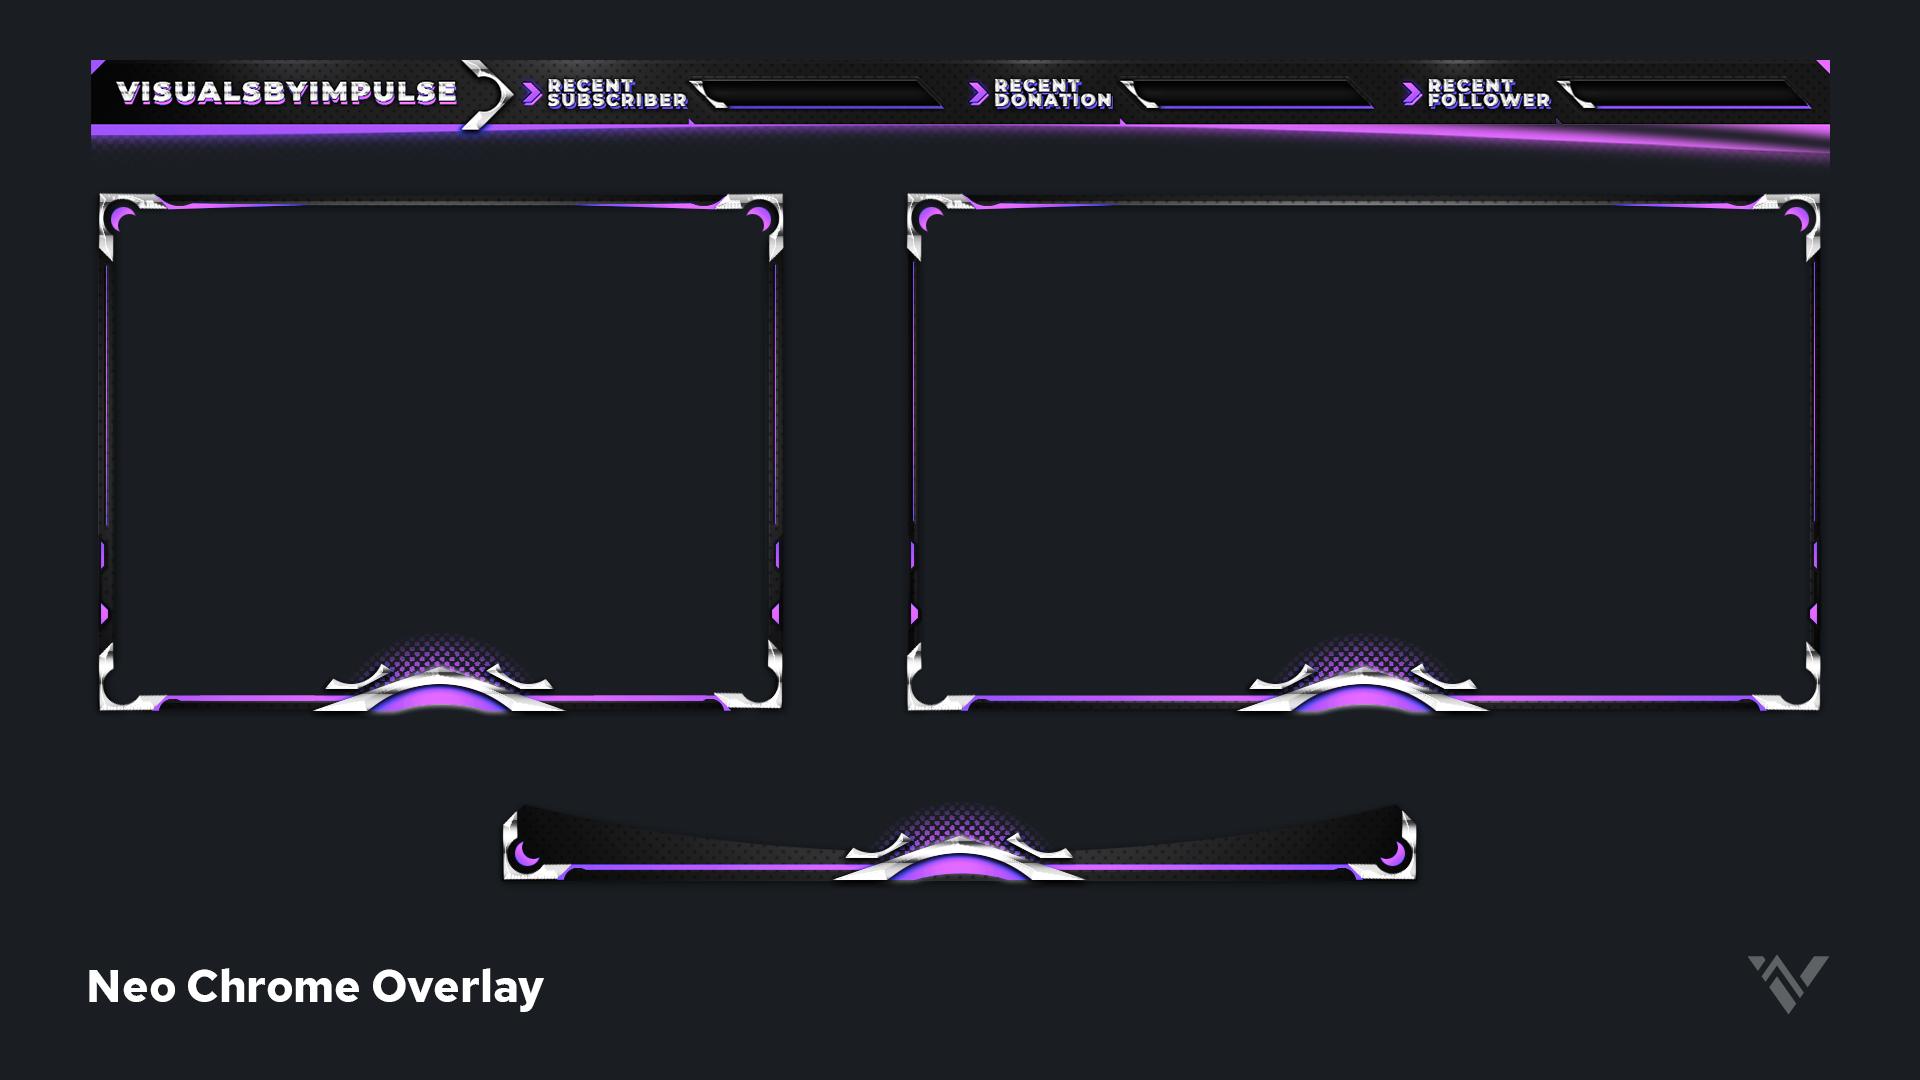 Neo Chrome Free Overlay - Visuals by Impulse